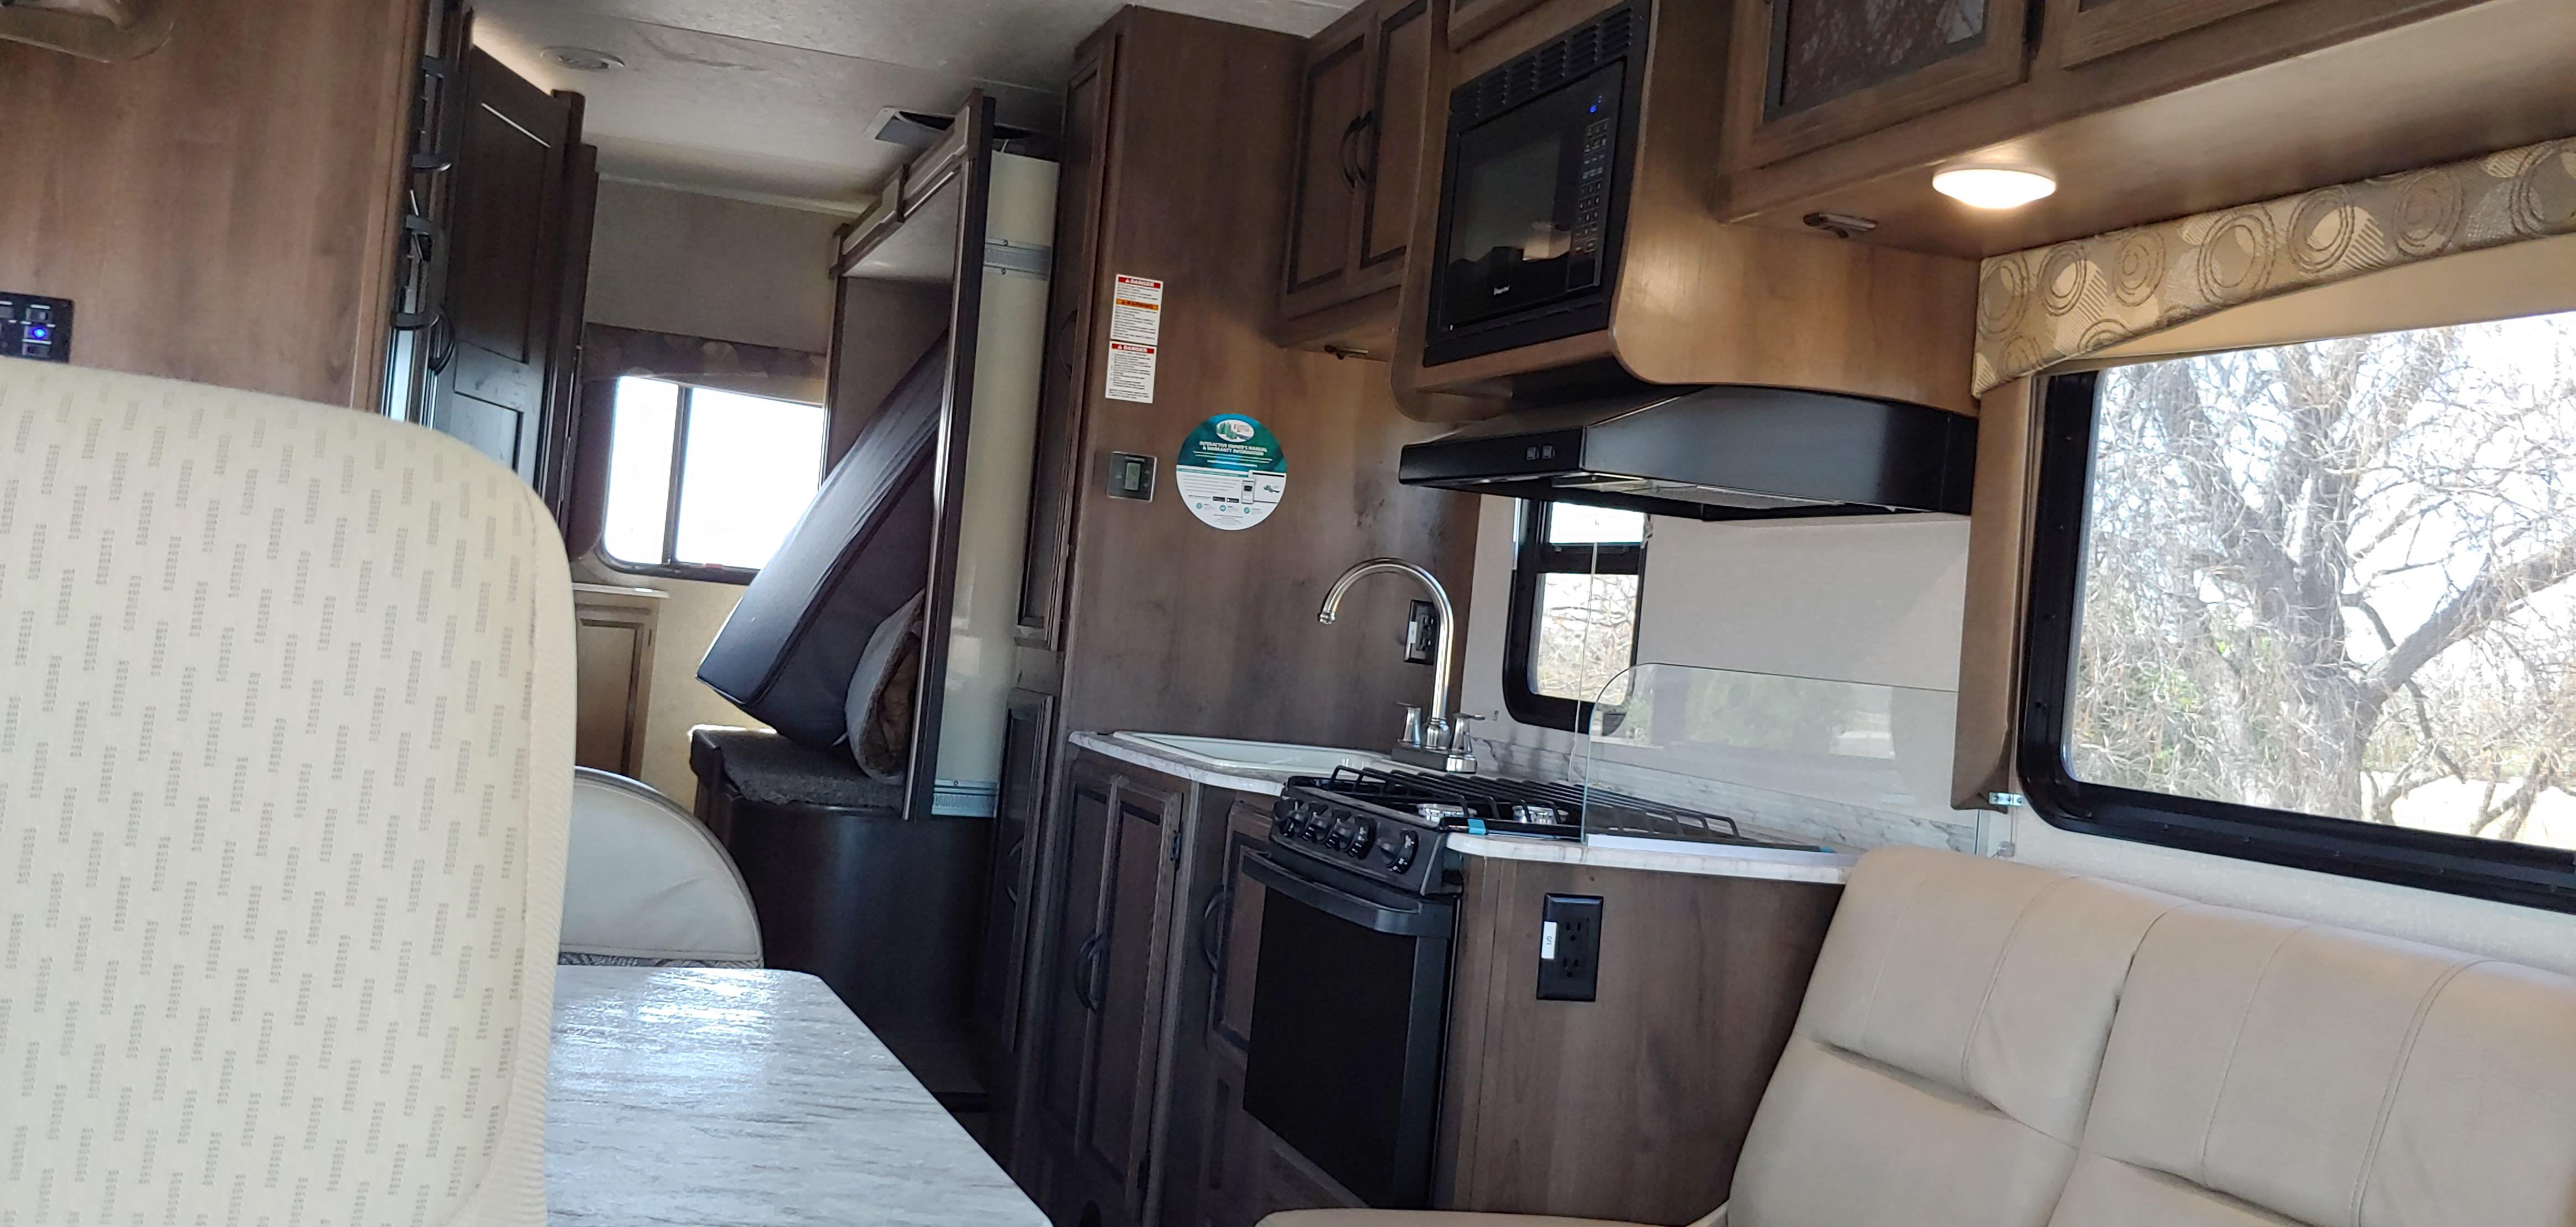 Still plenty of room to move around during travel.. Coachmen Freelander 2019